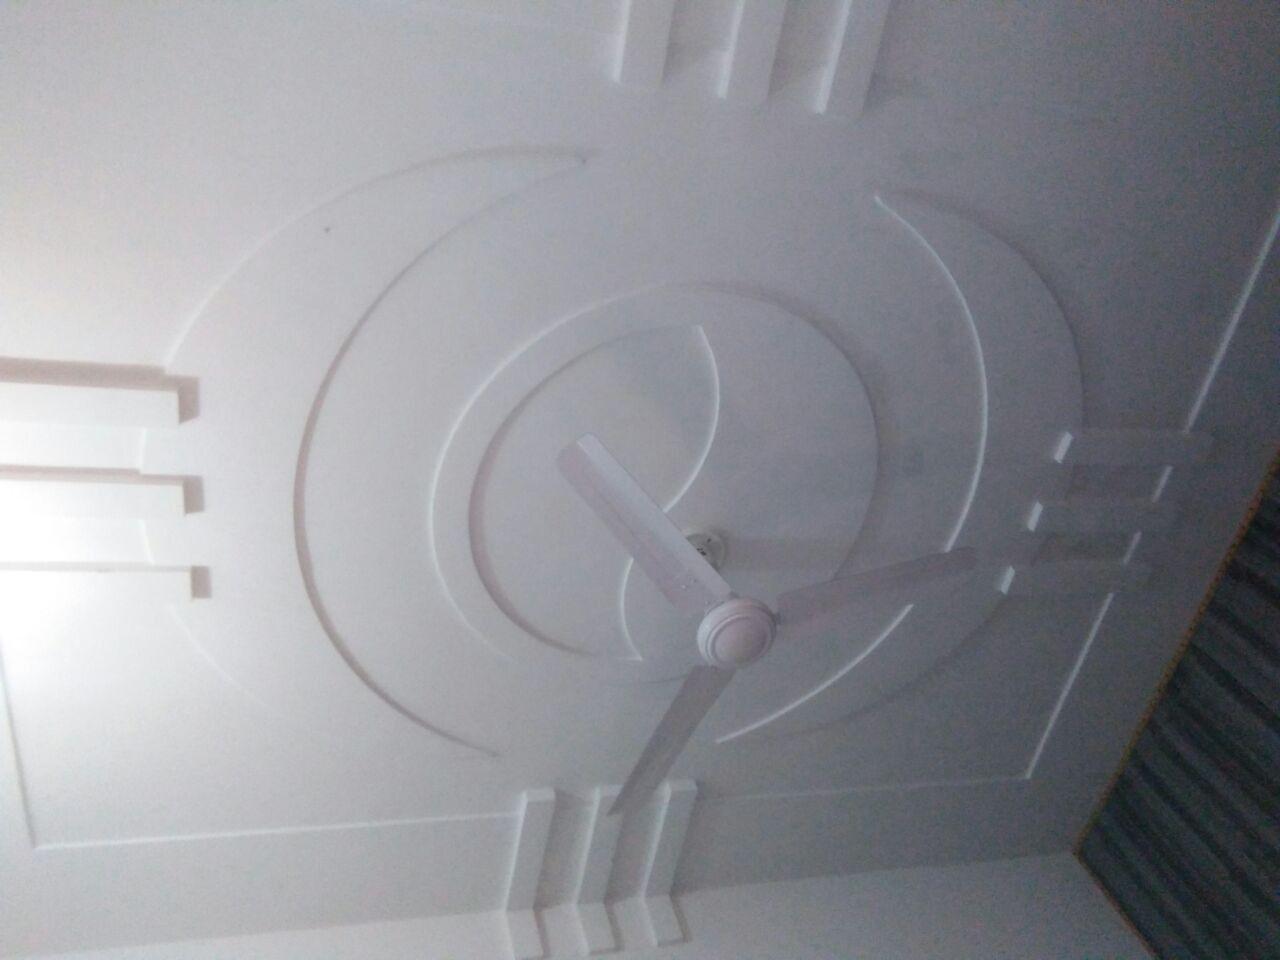 Pin By Pramod Kumar On Pop Design For Roof Pop False Ceiling Design Pop Ceiling Design Plaster Ceiling Design